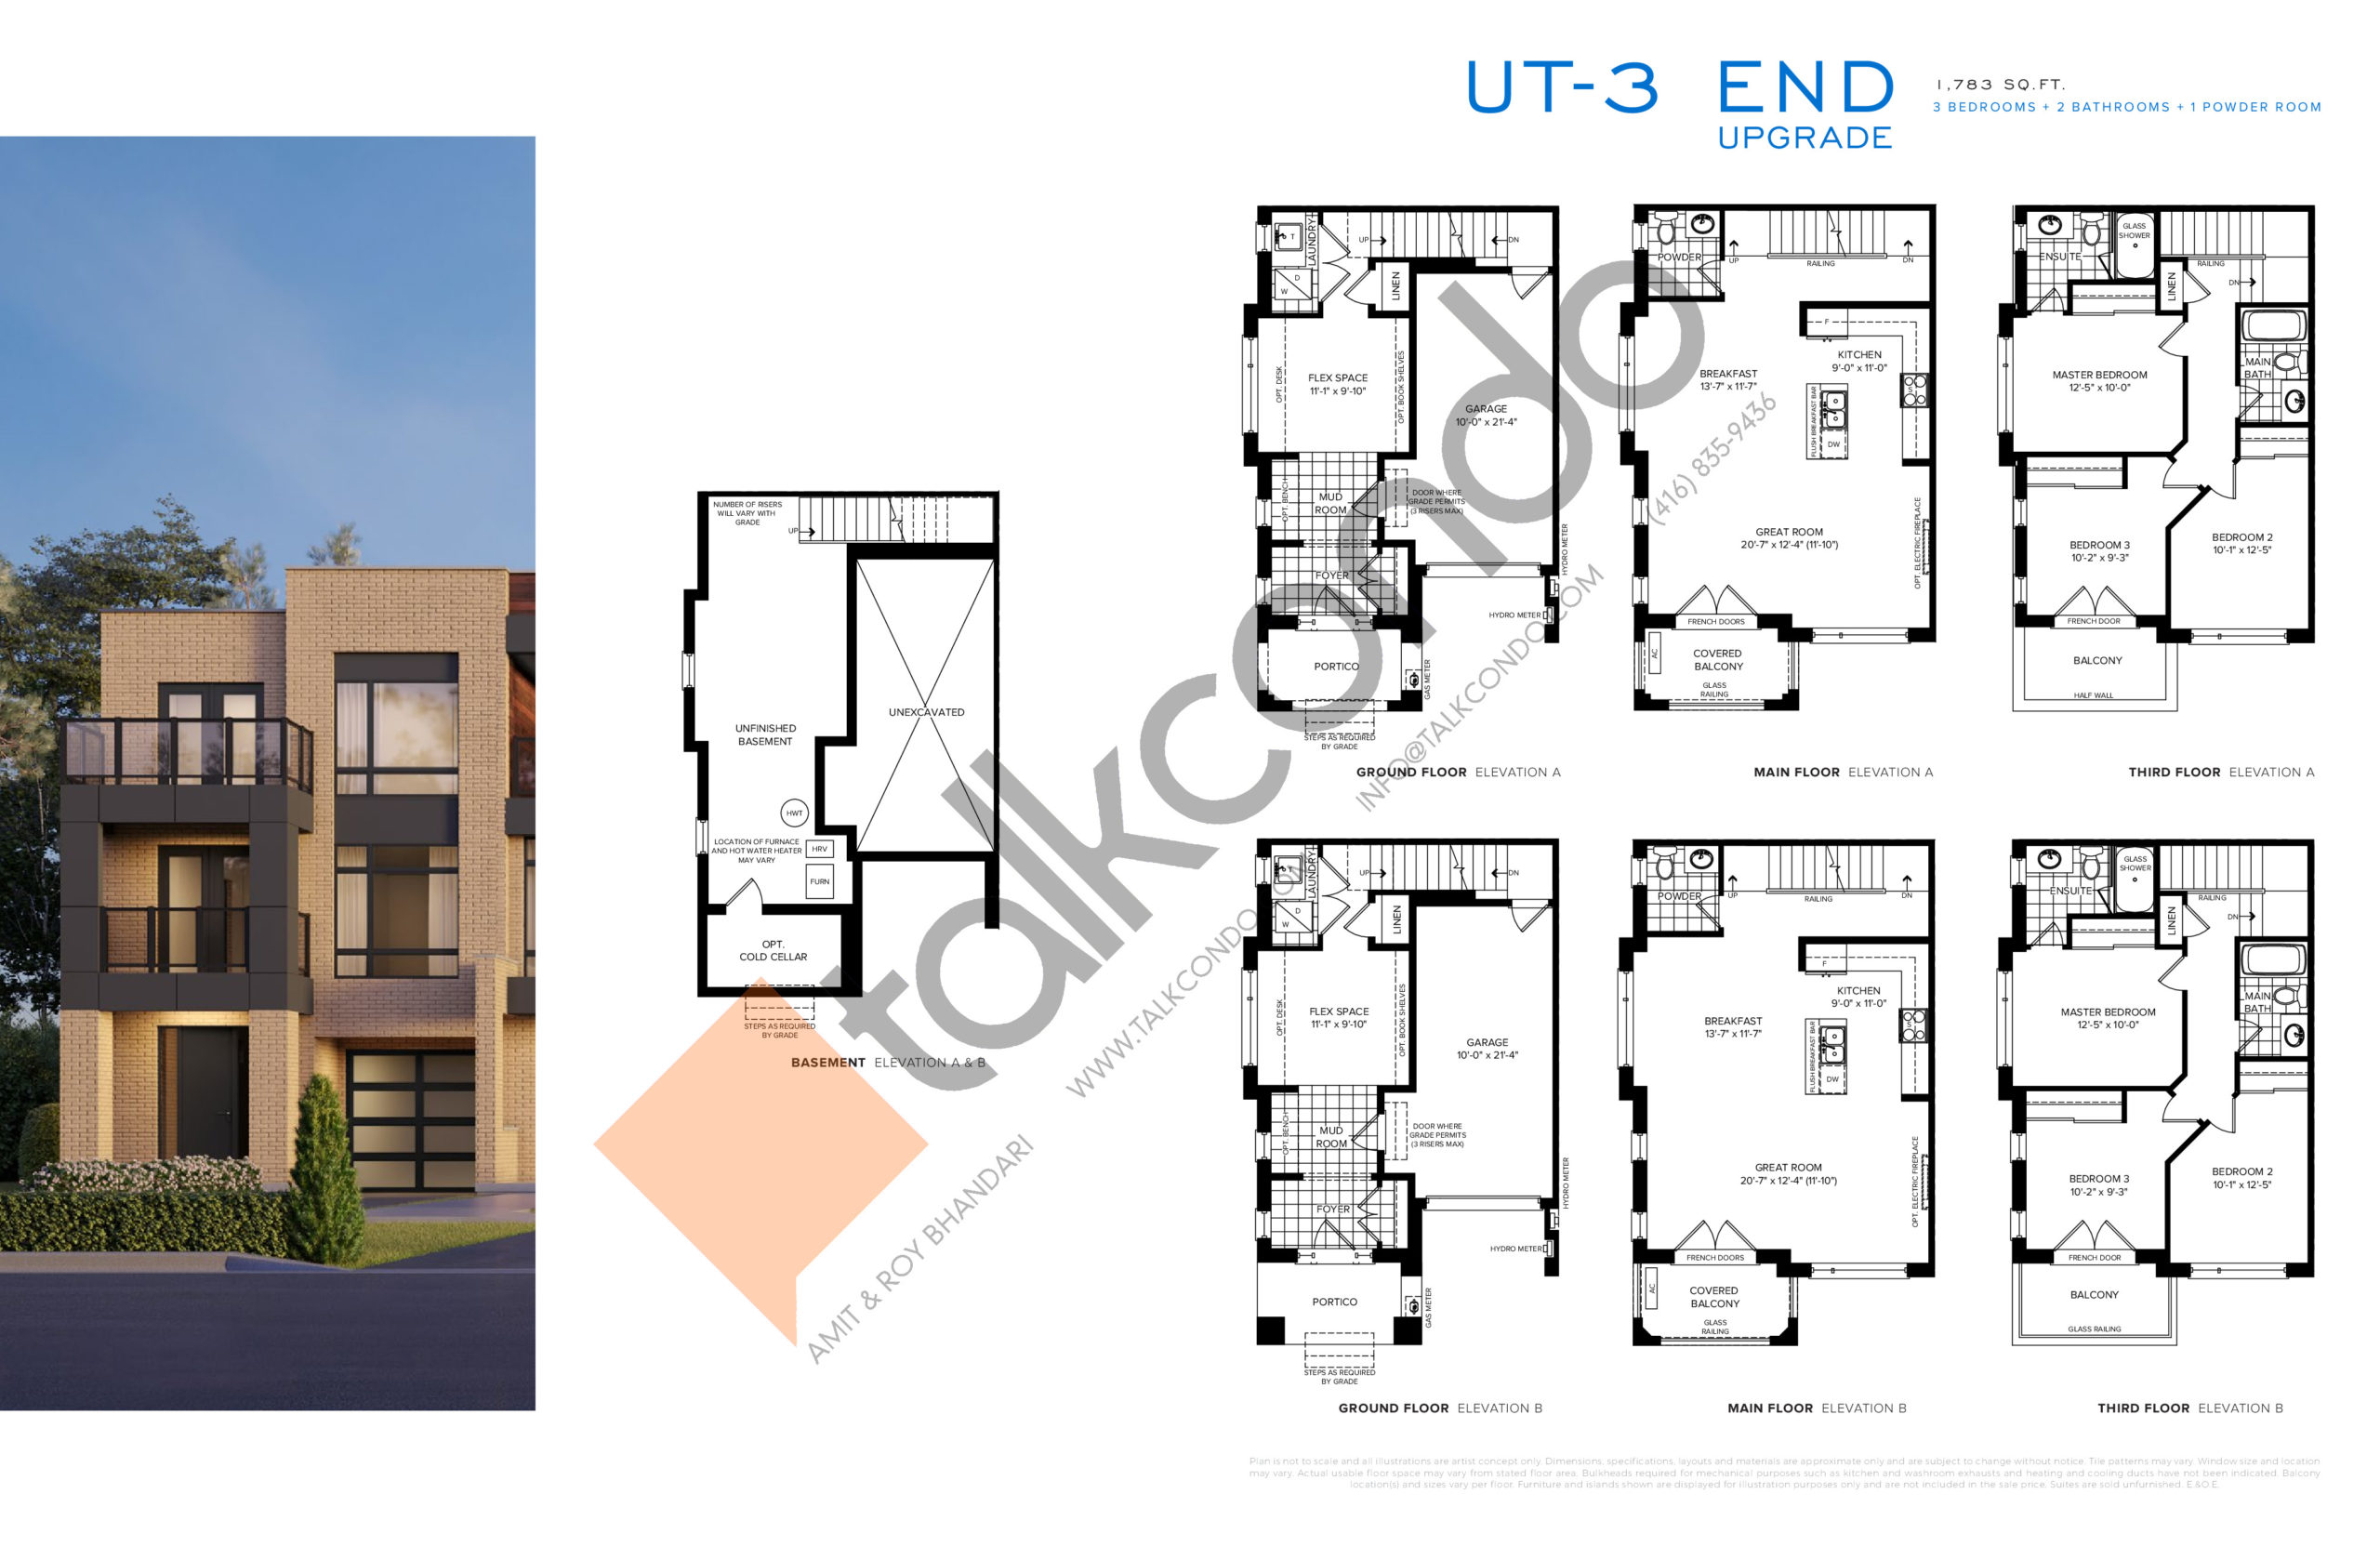 UT-3 End Upgrade Floor Plan at SXSW Ravine Towns - 1783 sq.ft